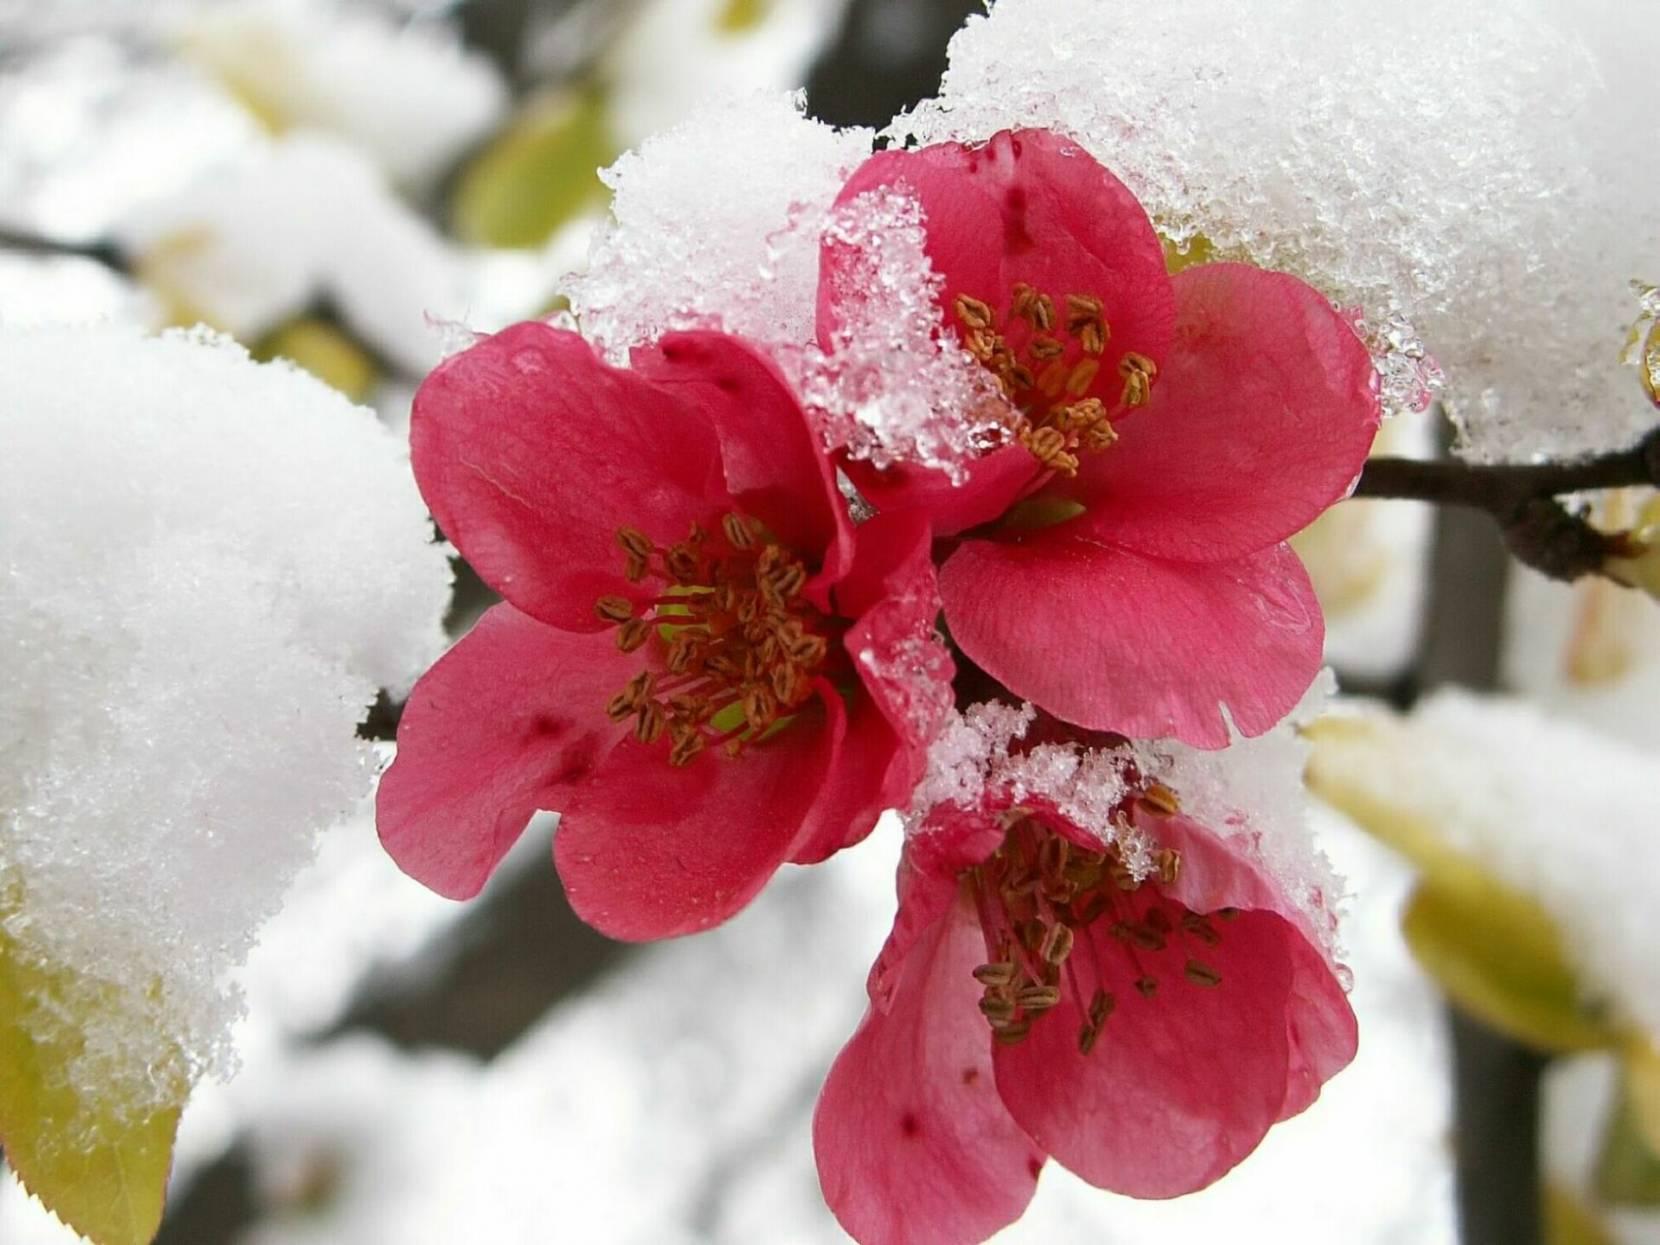 Открытка с цветами на снегу